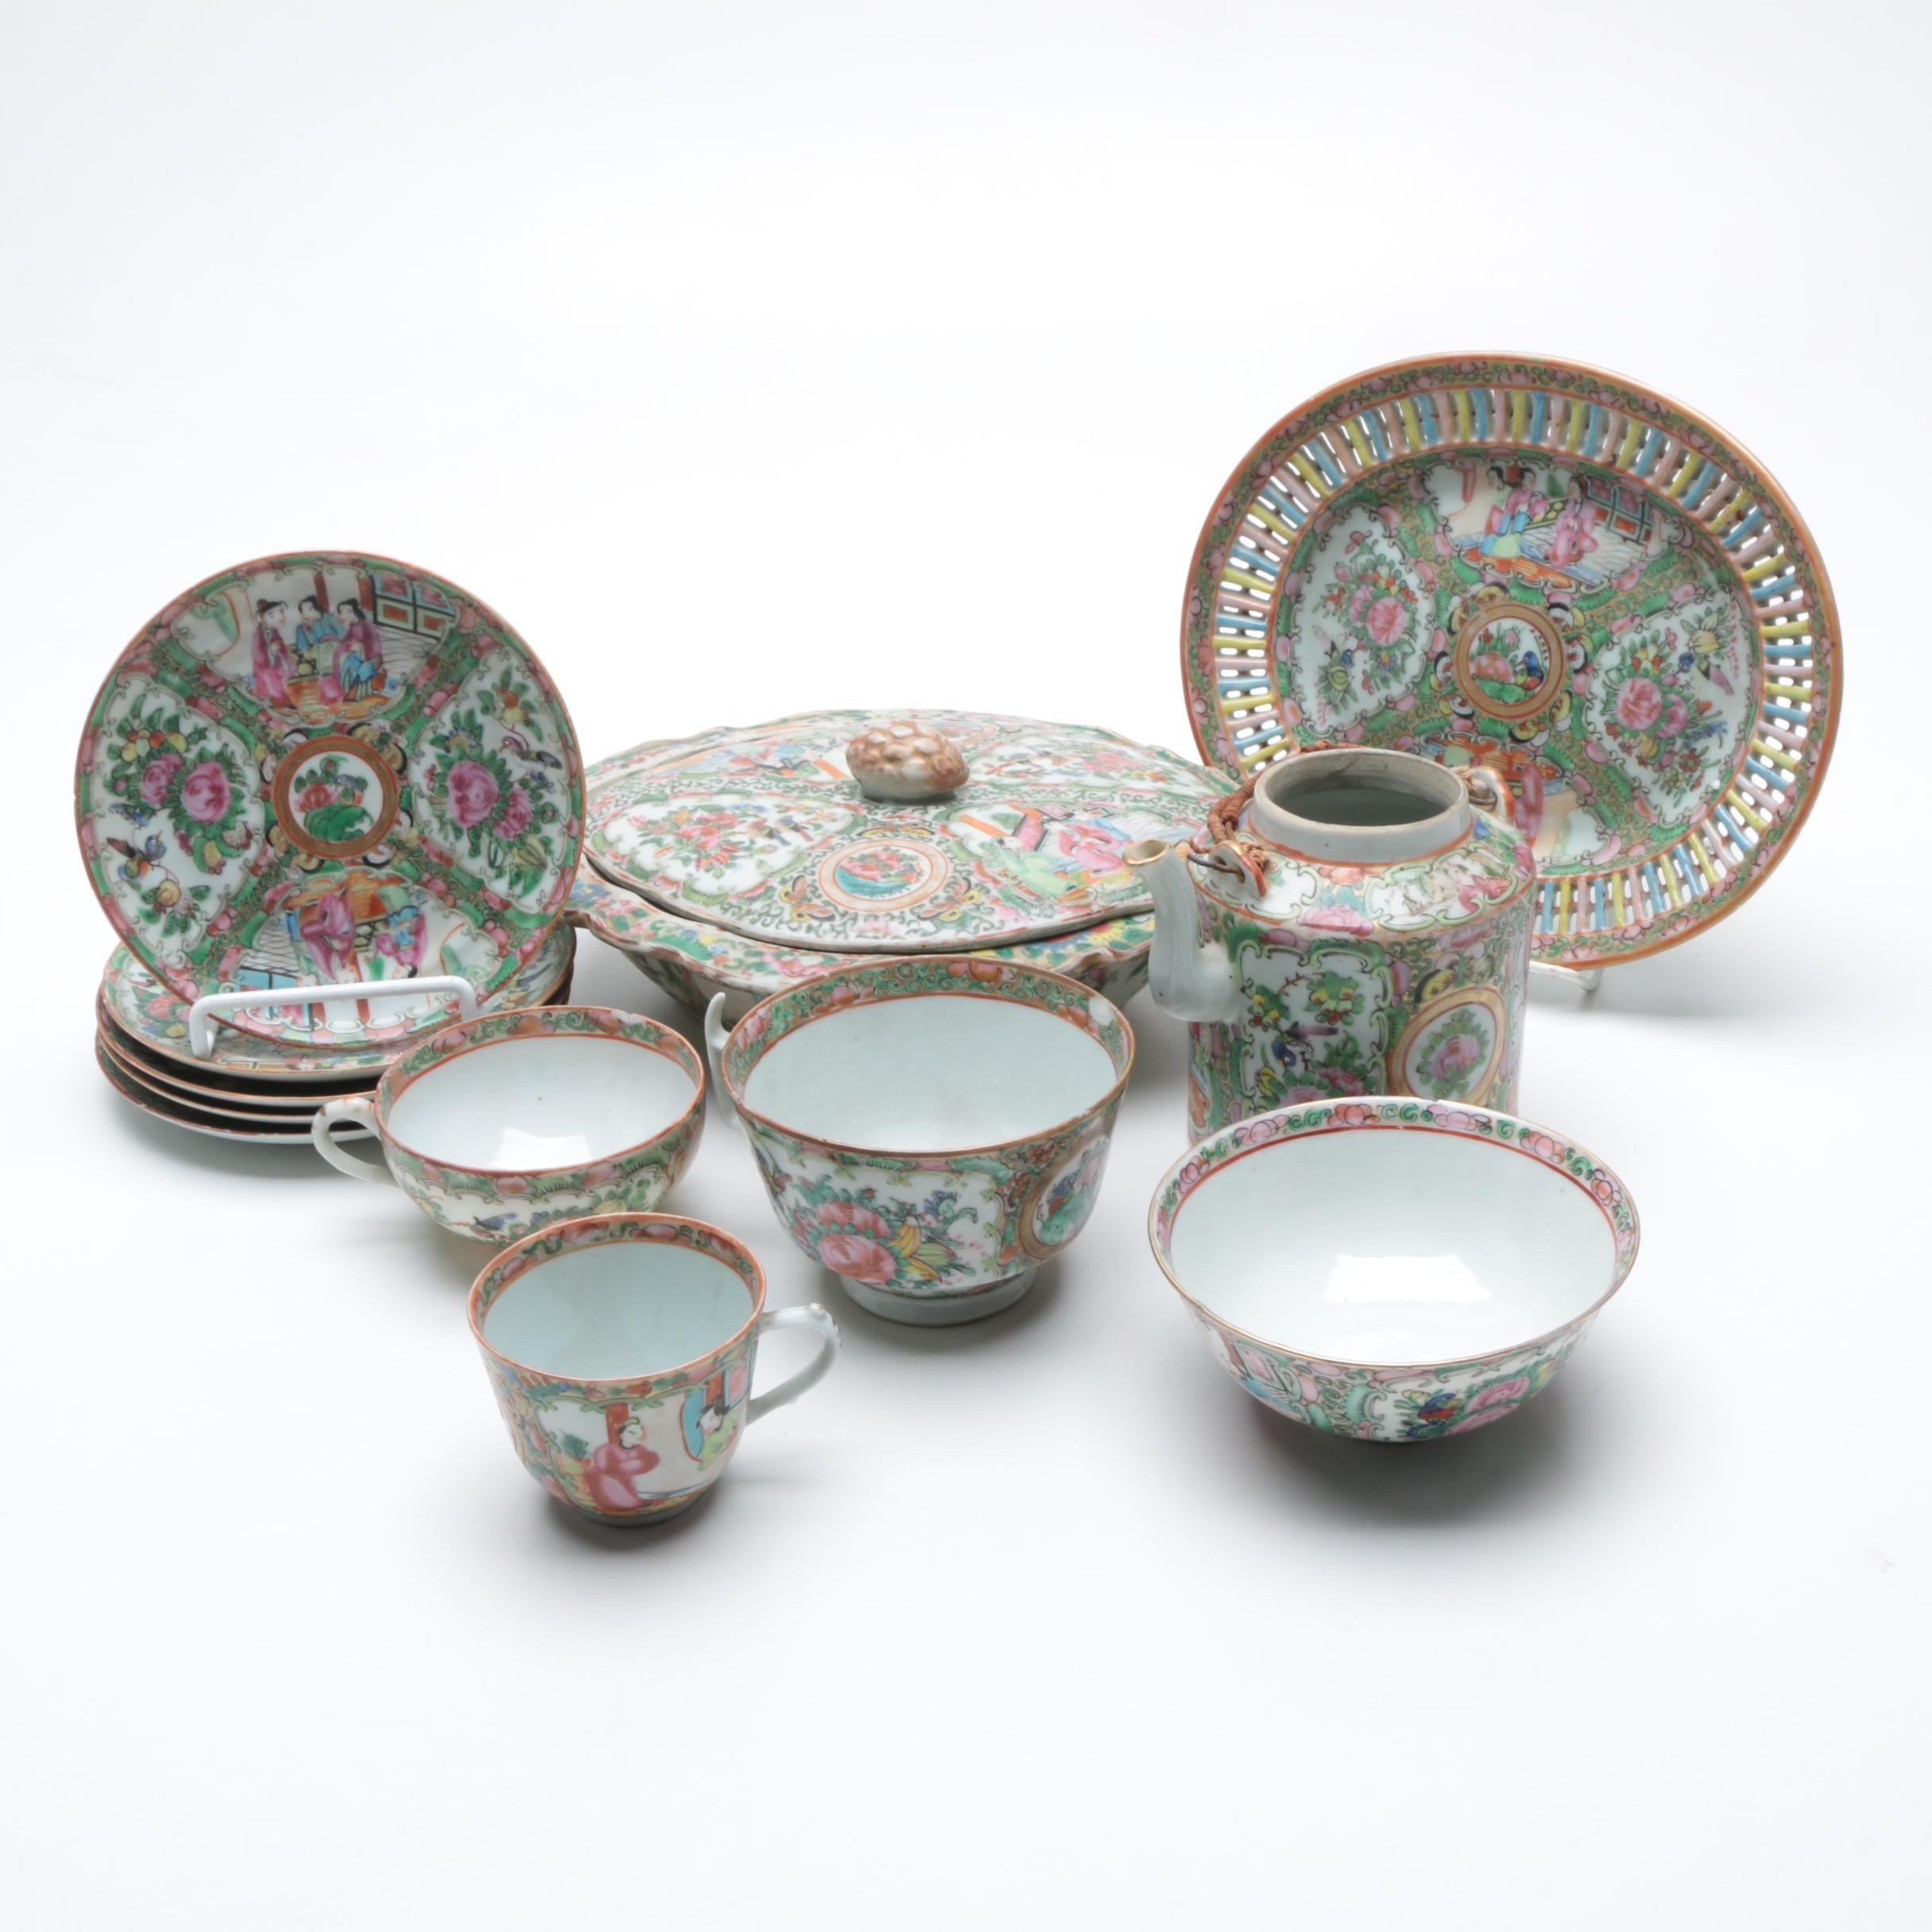 Vintage Chinese Rose Medallion Tableware